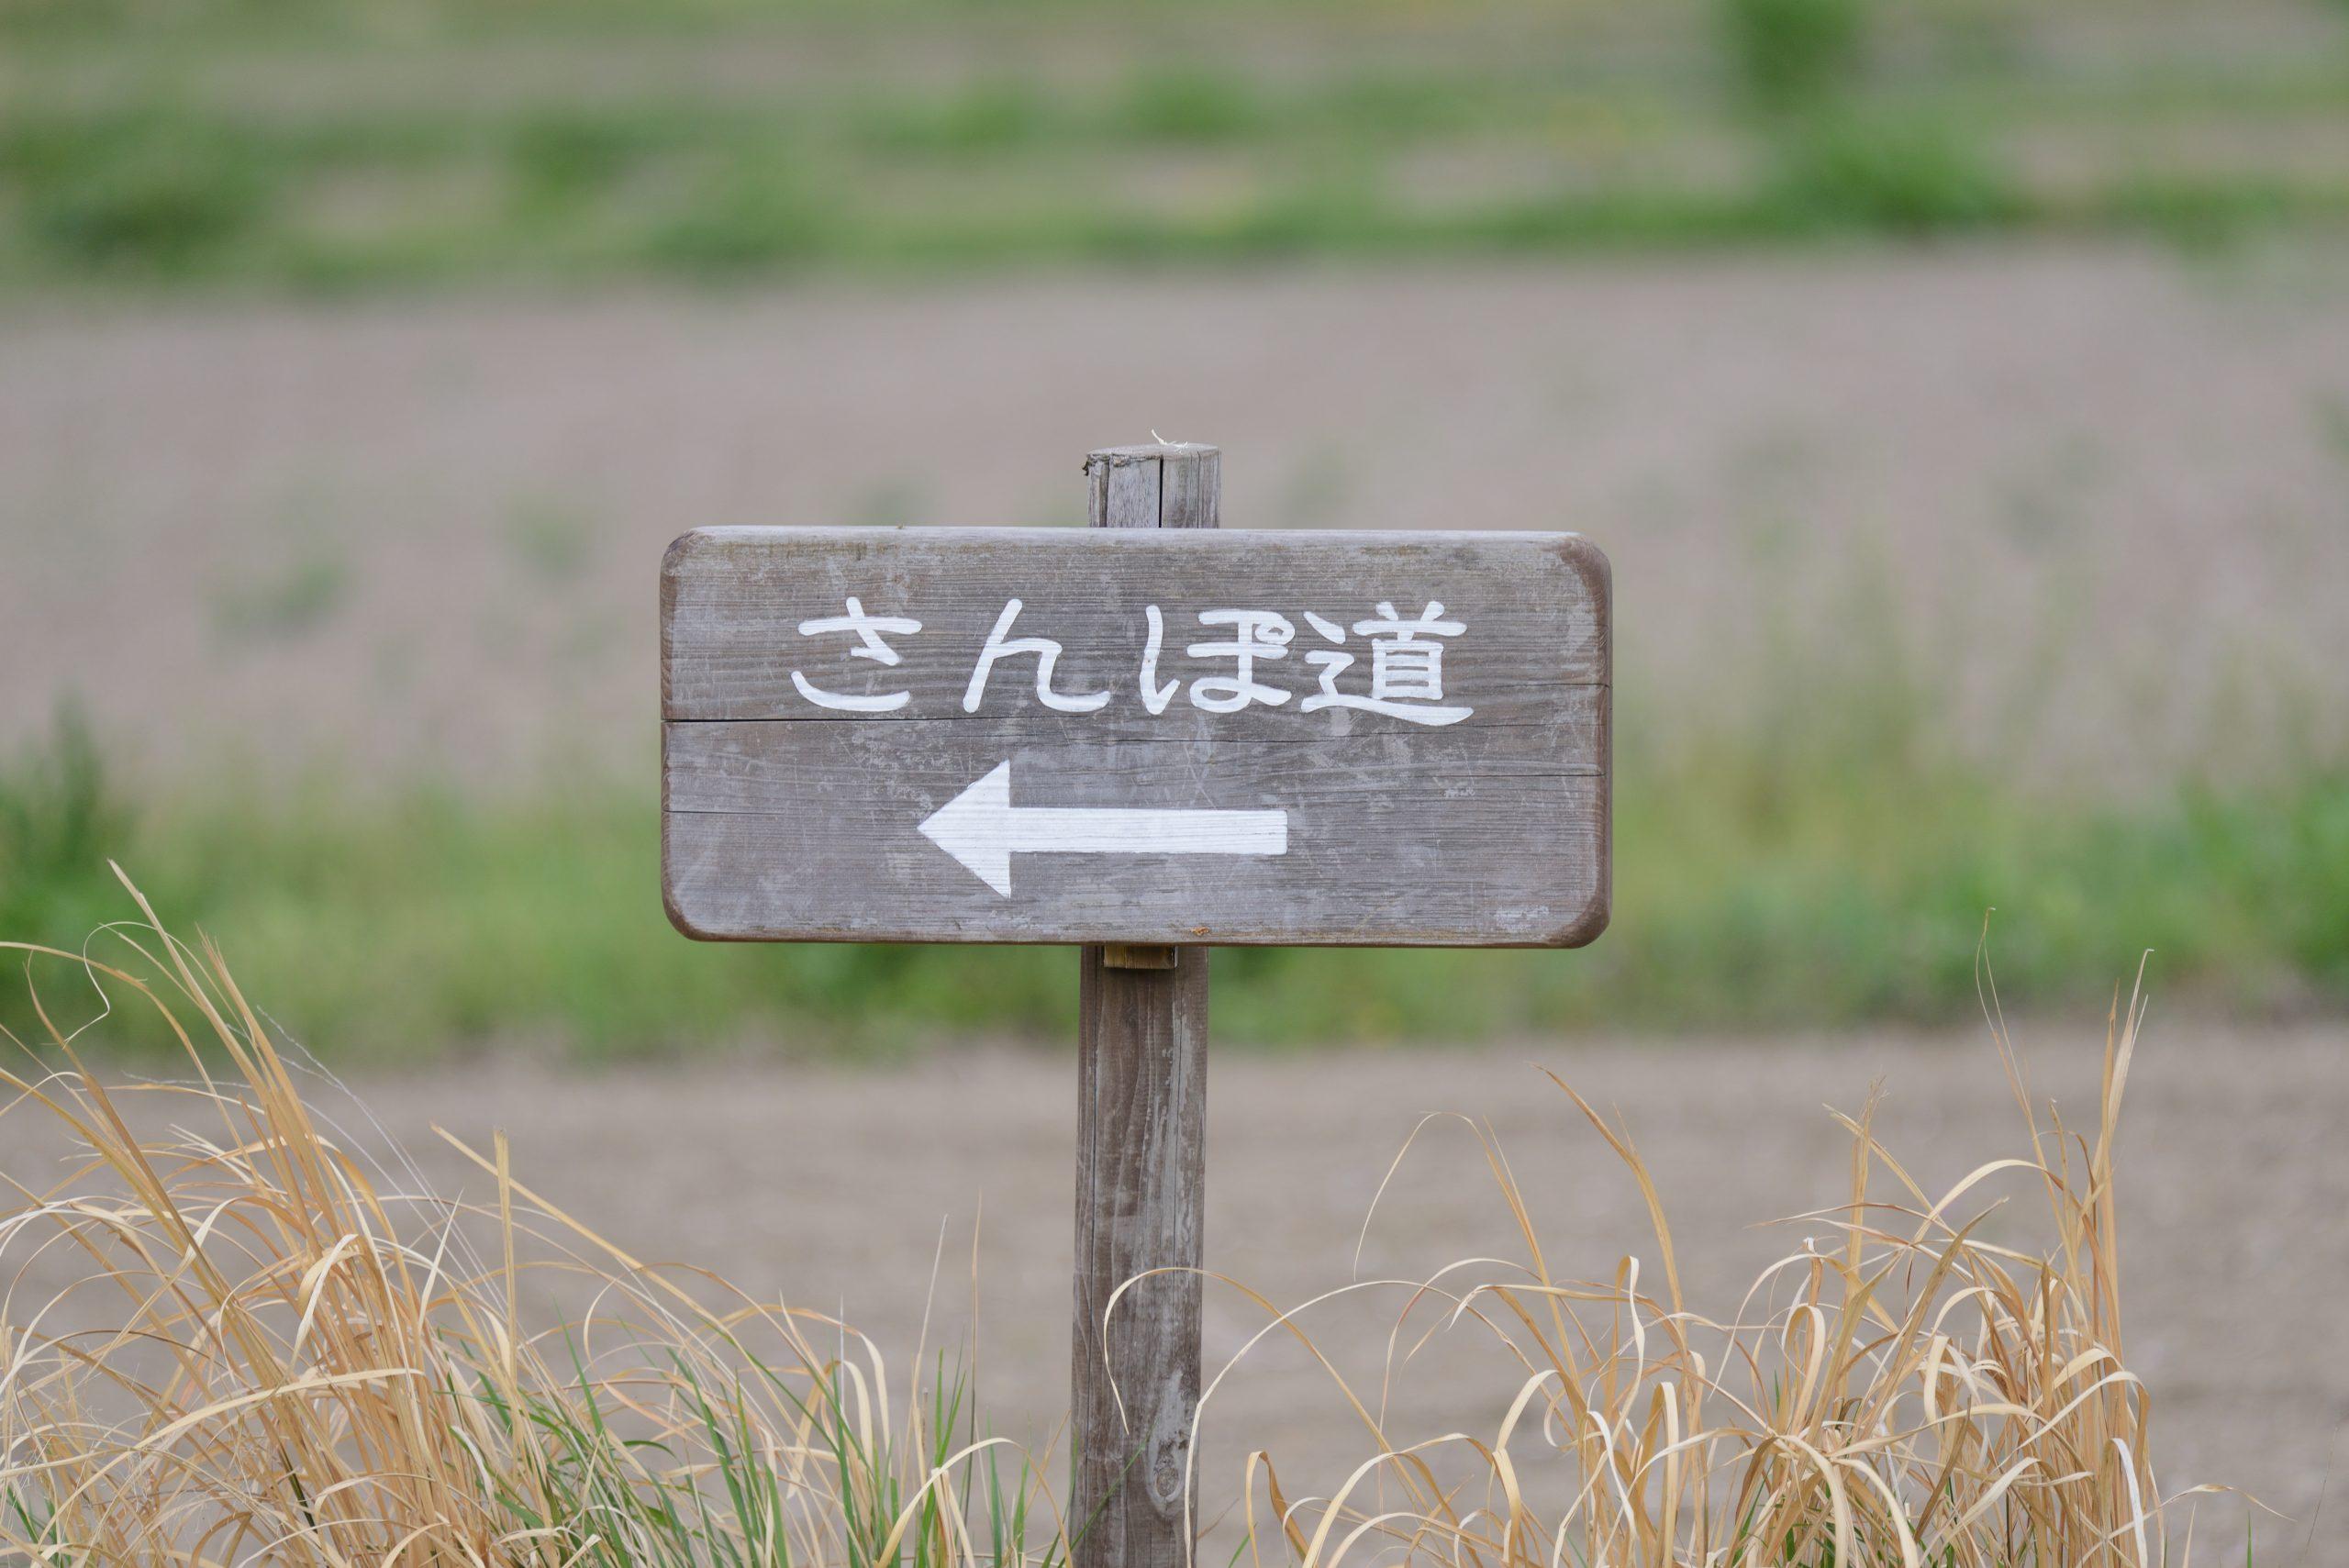 【Nikon】春の望遠スナップ